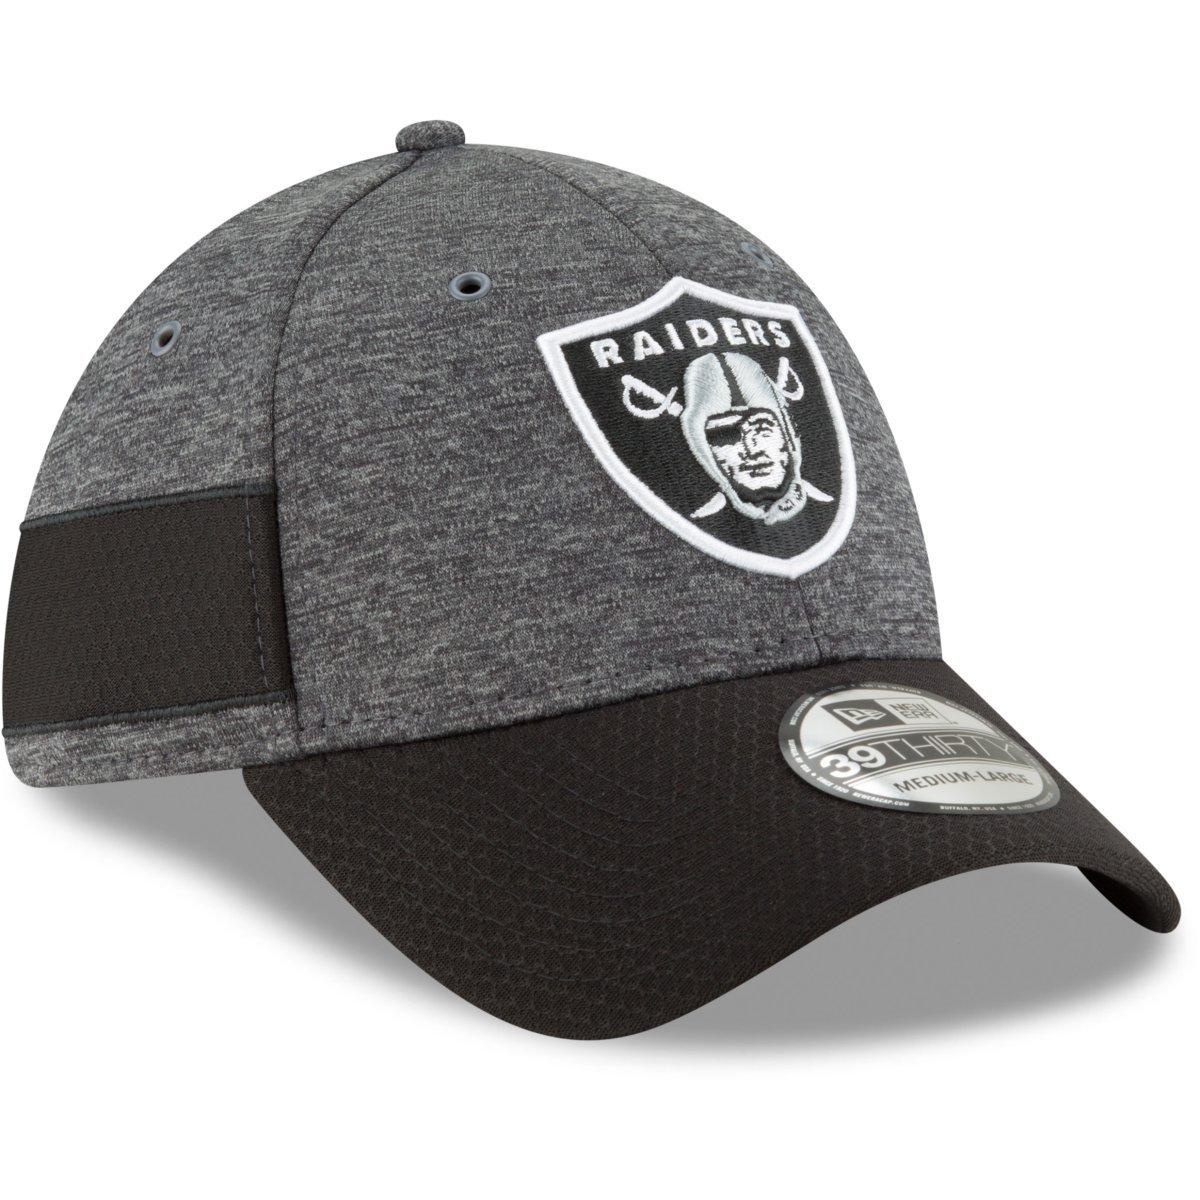 New Era 39Thirty Shadow-Tech Cap NFL Sideline Graphite Home